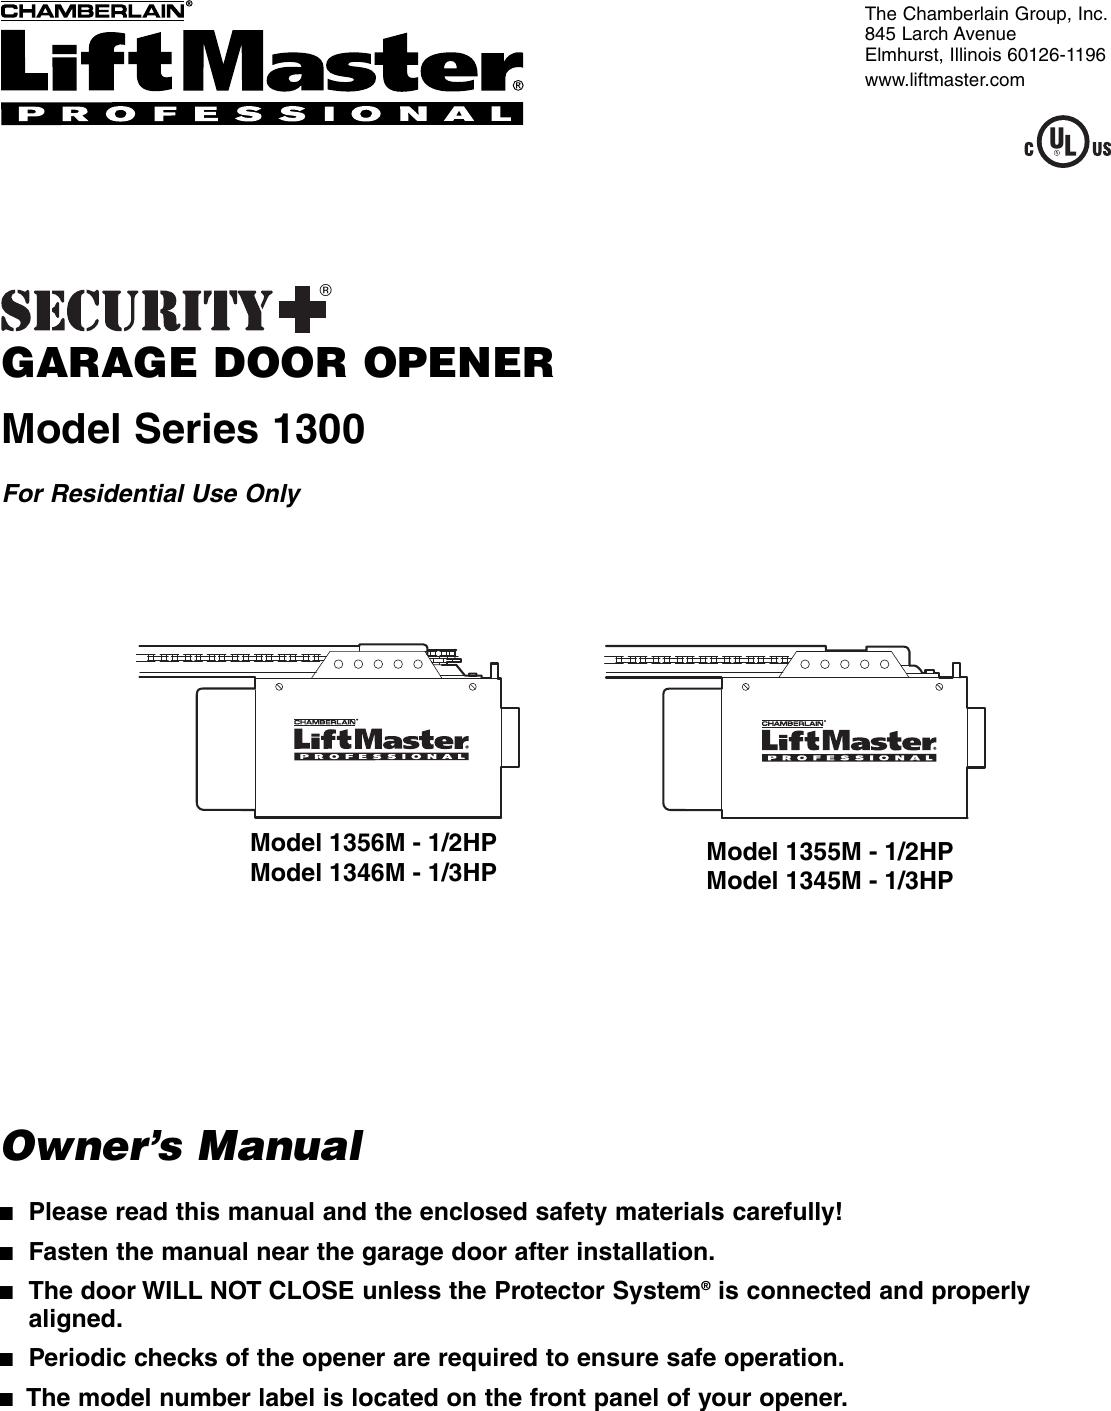 Chamberlain 1345m Users Manual 114a3587 1m Liftmaster Garage Door Receiver Logic Circuit Board